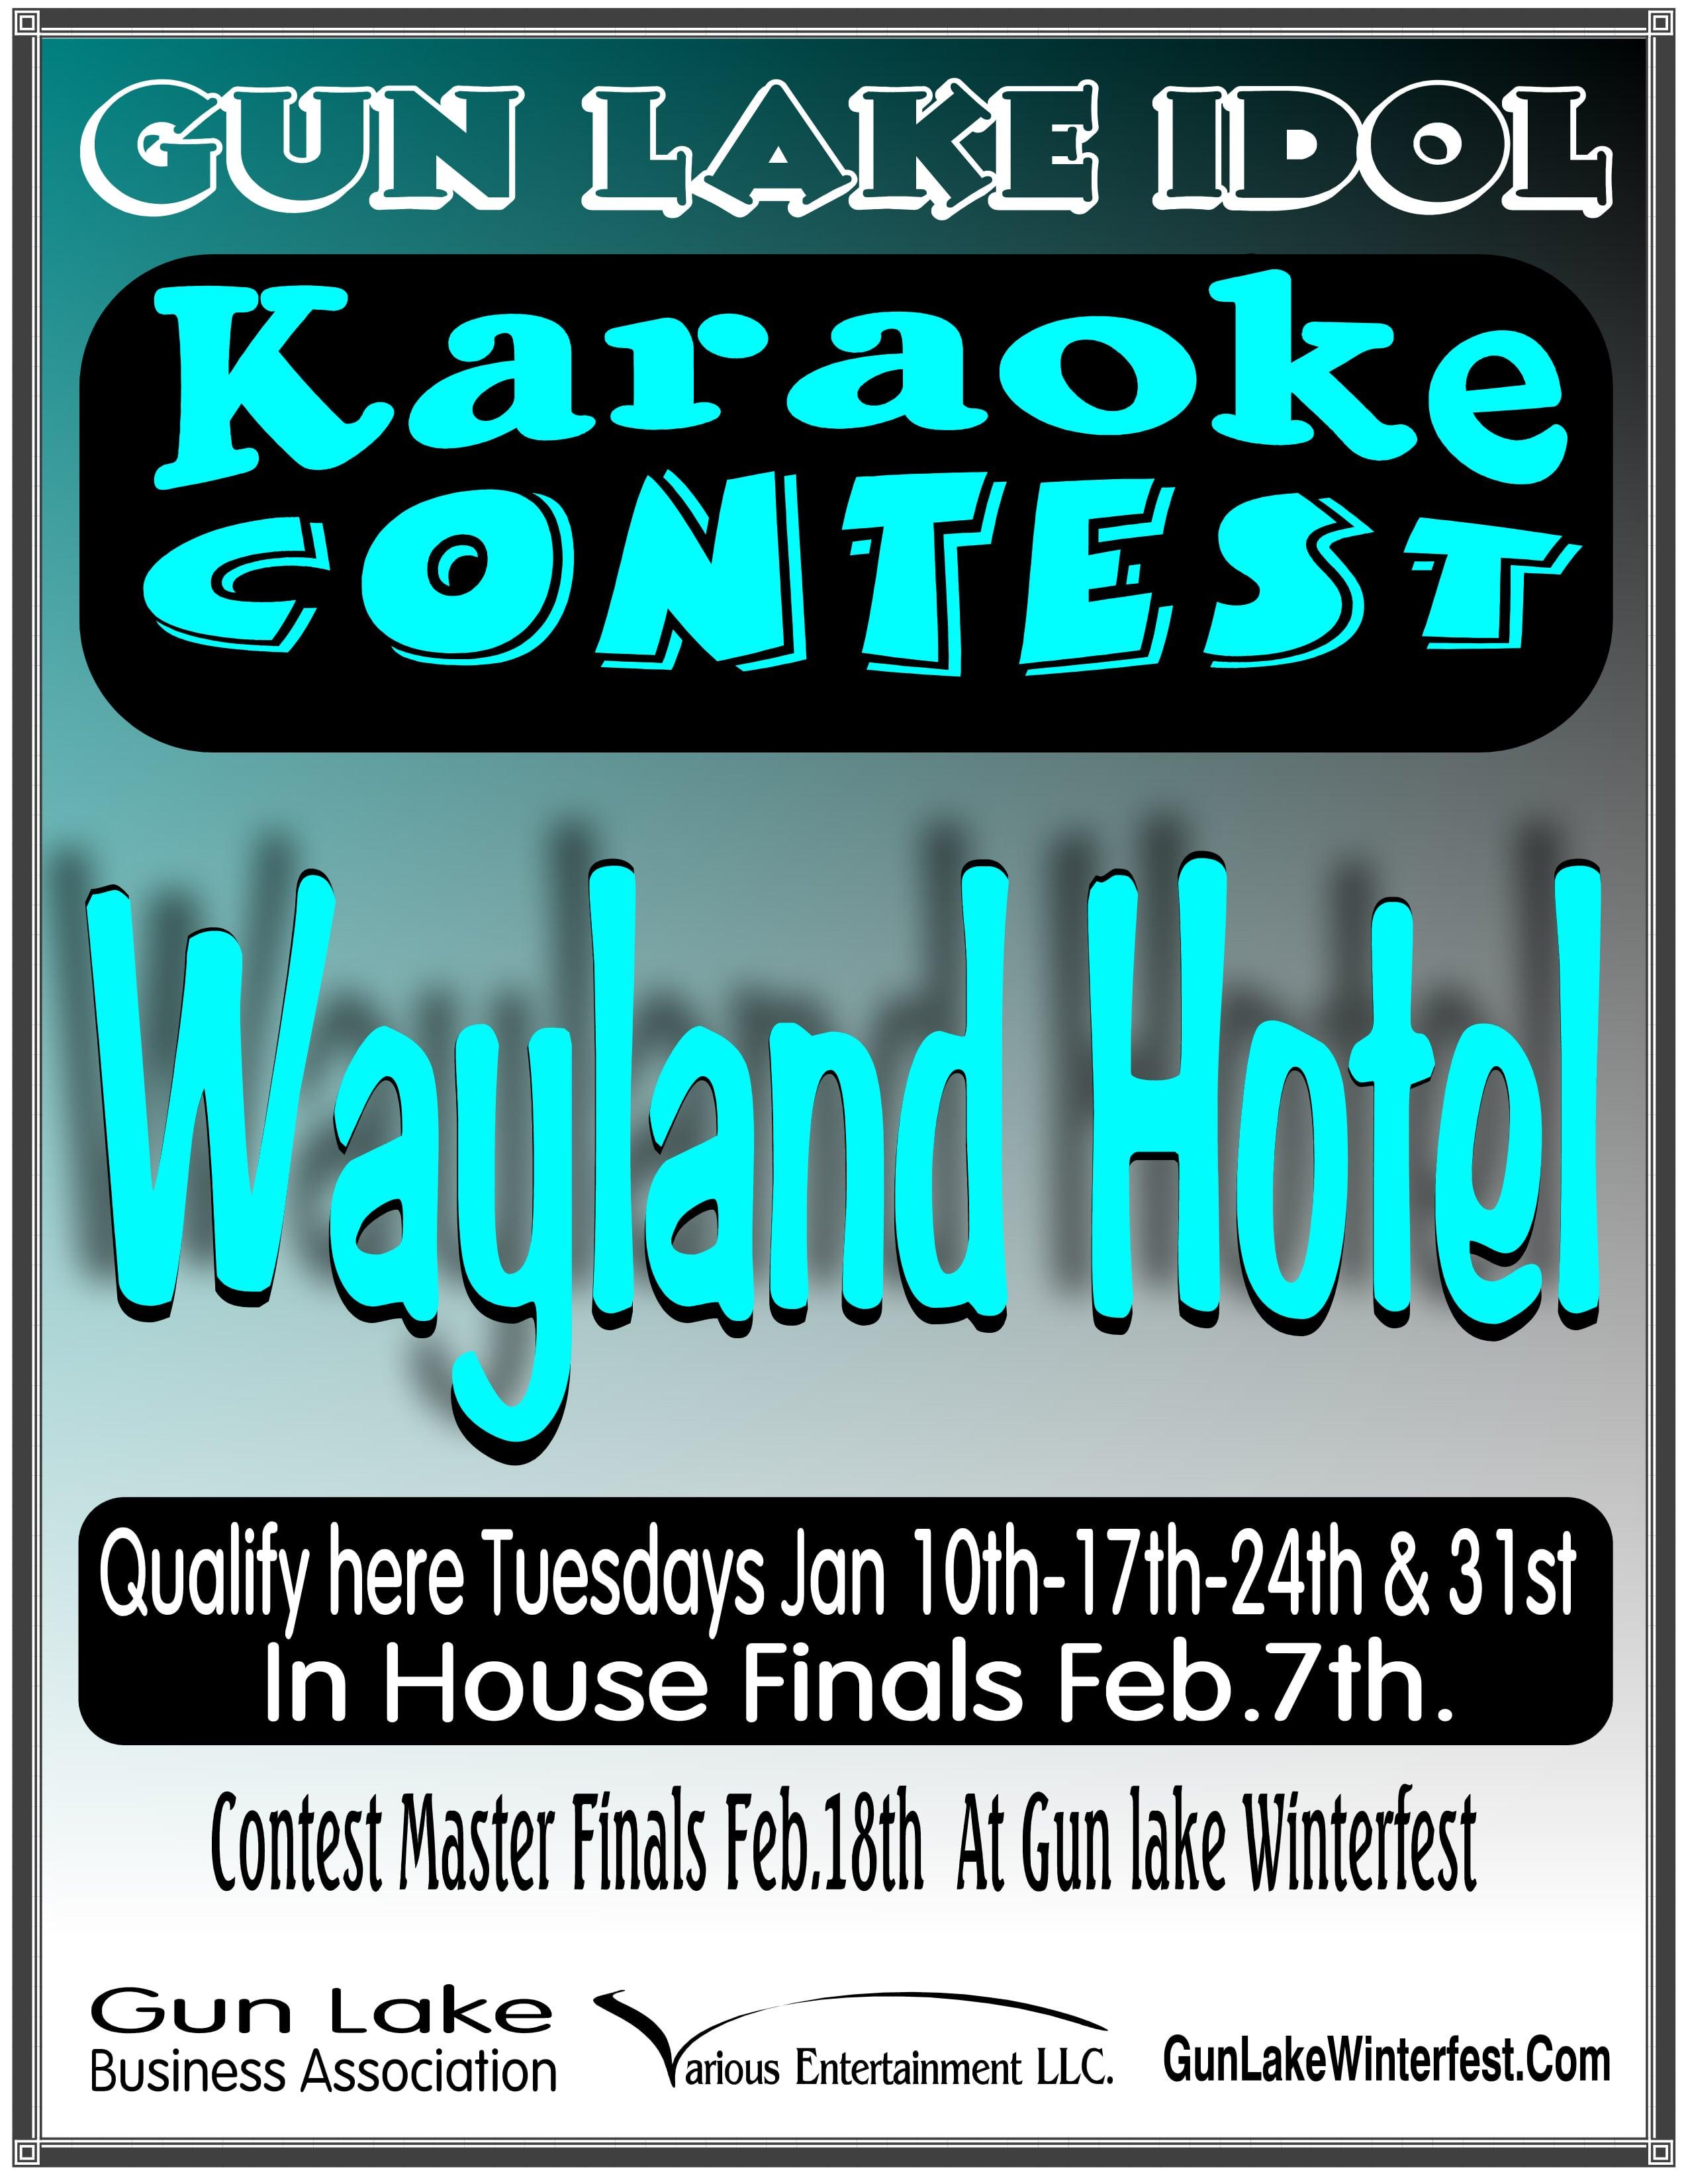 Wayland Hotel Karaoke Contest